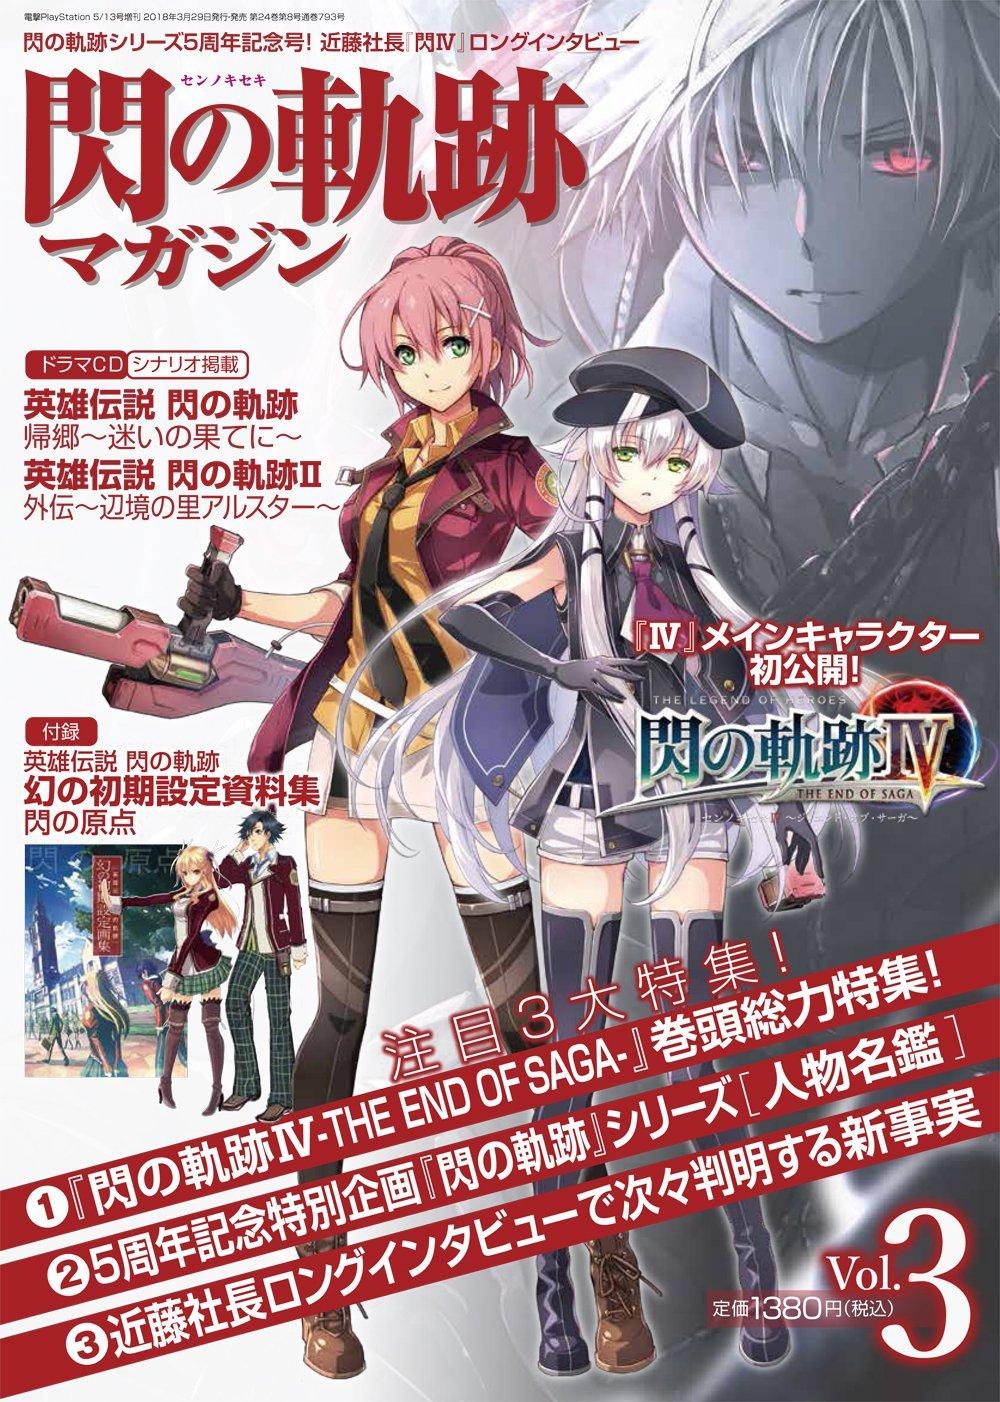 Sen no Kiseki Magazine Vol. 03 (May 13, 2018)